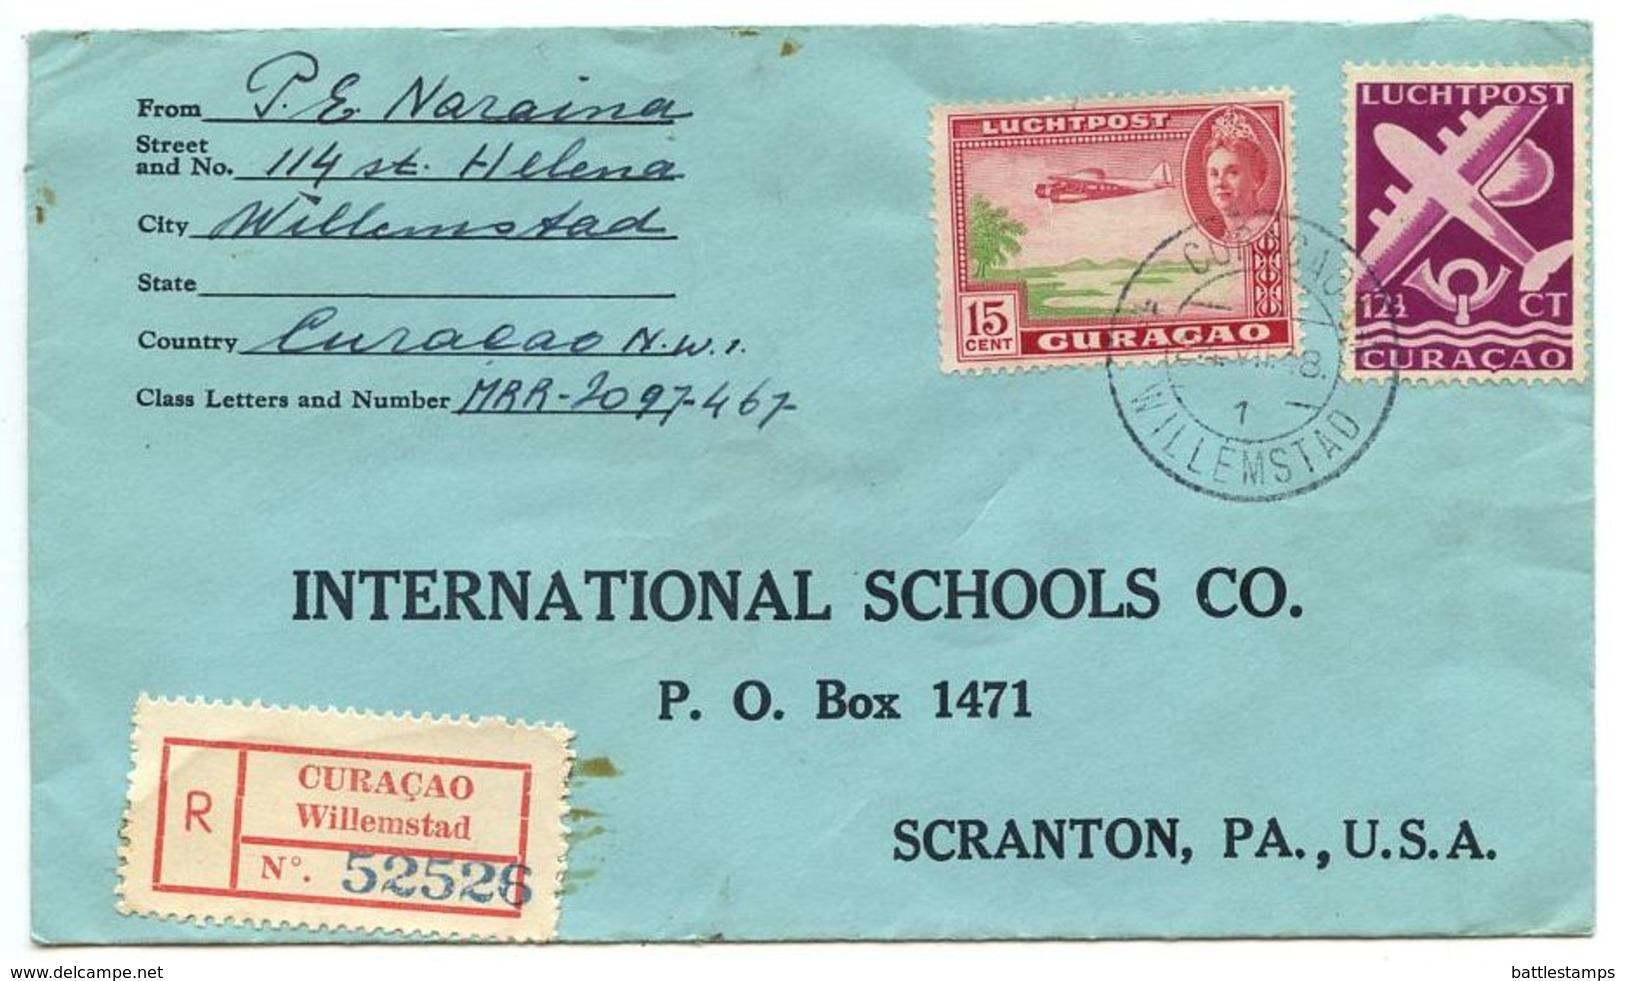 Netherlands Antilles 1948 Registered Cover Curaçao, Willemstad To U.S. W/ Scott C19 & C33A - Curaçao, Antilles Neérlandaises, Aruba